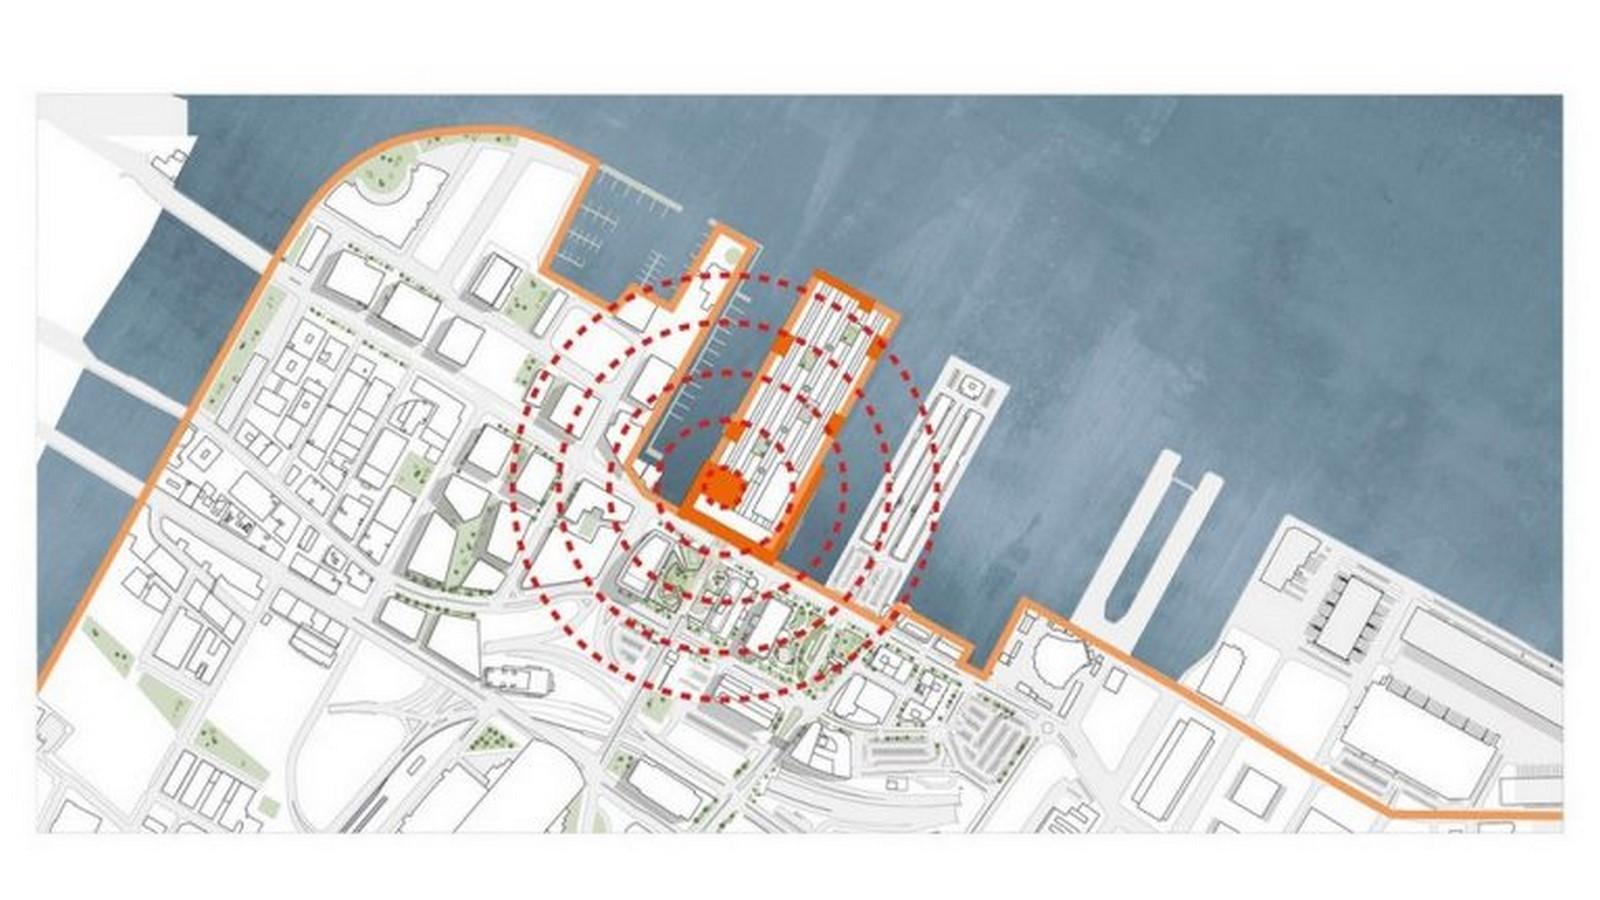 Construction begins at Boston's Commonwealth Pier designed by Schmidt Hammer Lassen Architects - Sheet3